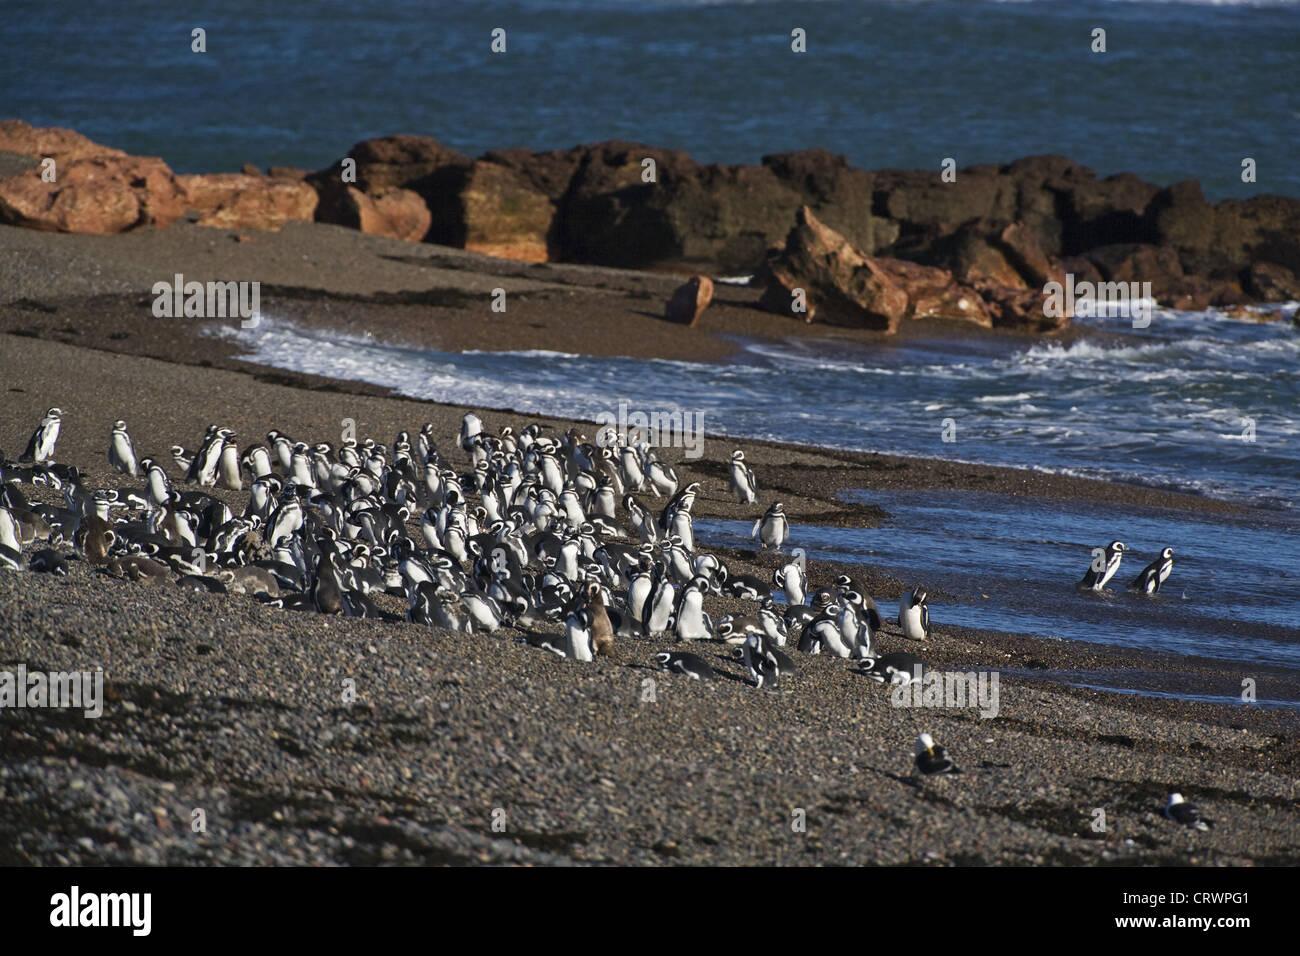 Magellan penguin colony - Stock Image